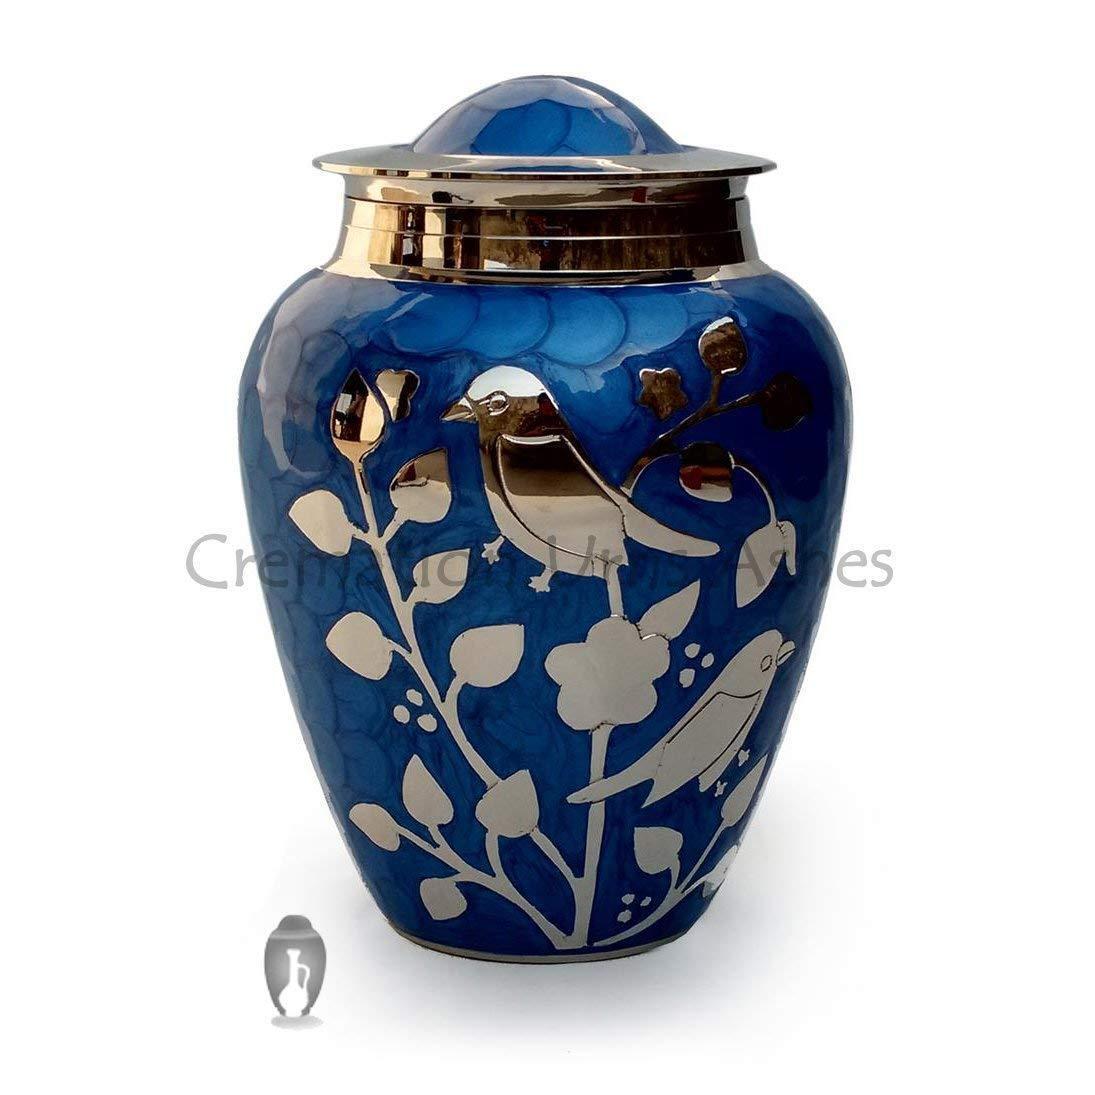 Plata Bendición Pájaros Grande Adultos Urna Cenizas en Azul, Cremation Urns